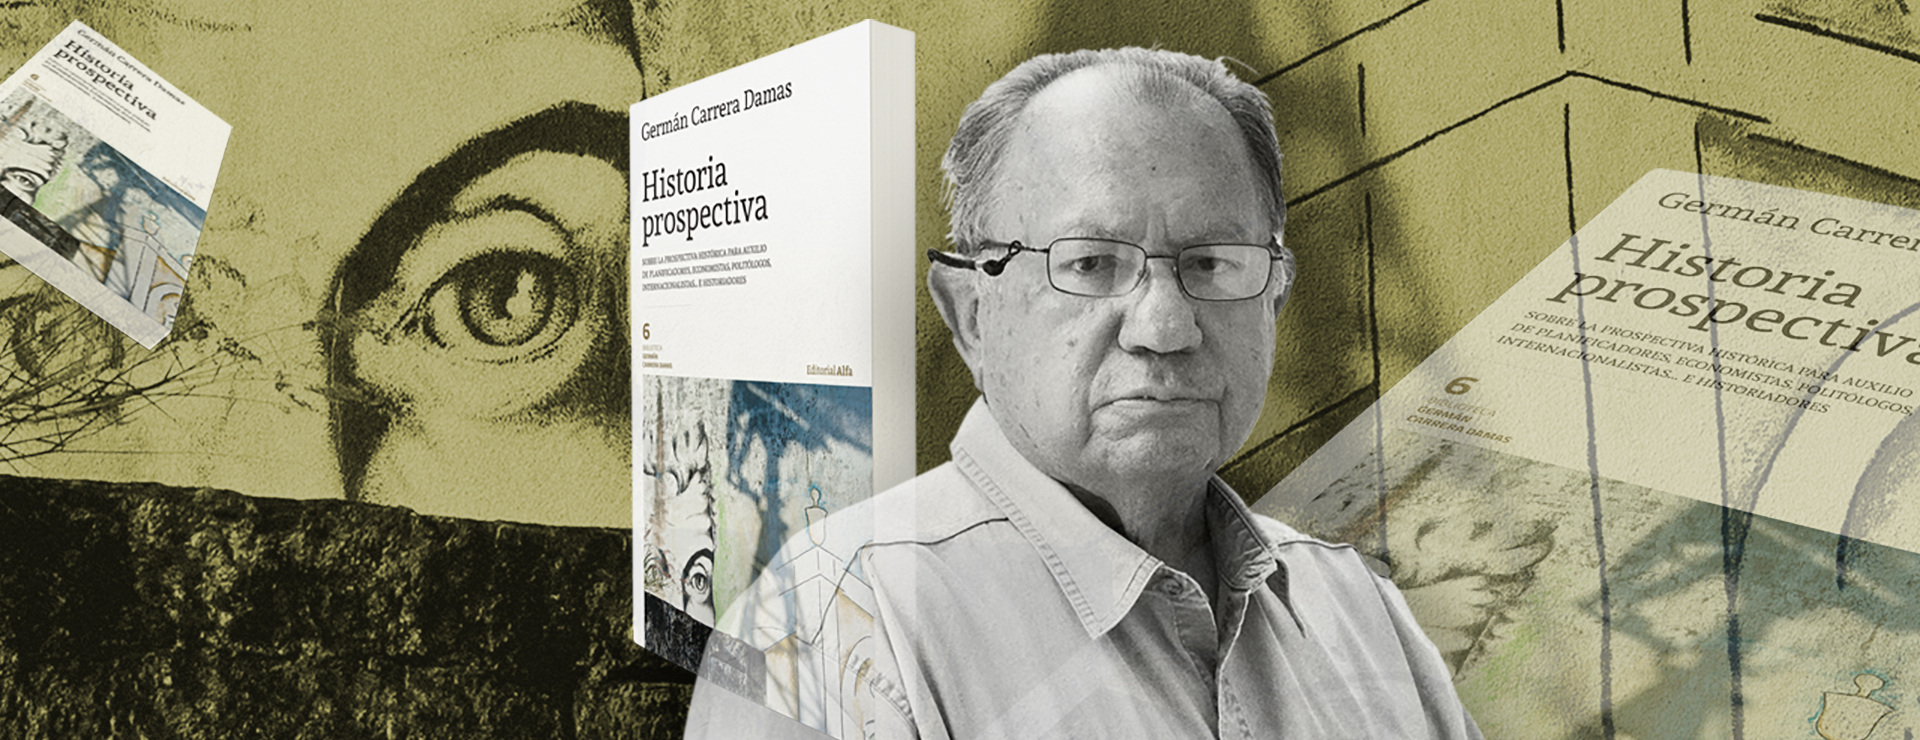 Carrusel principal - Historia prospectiva